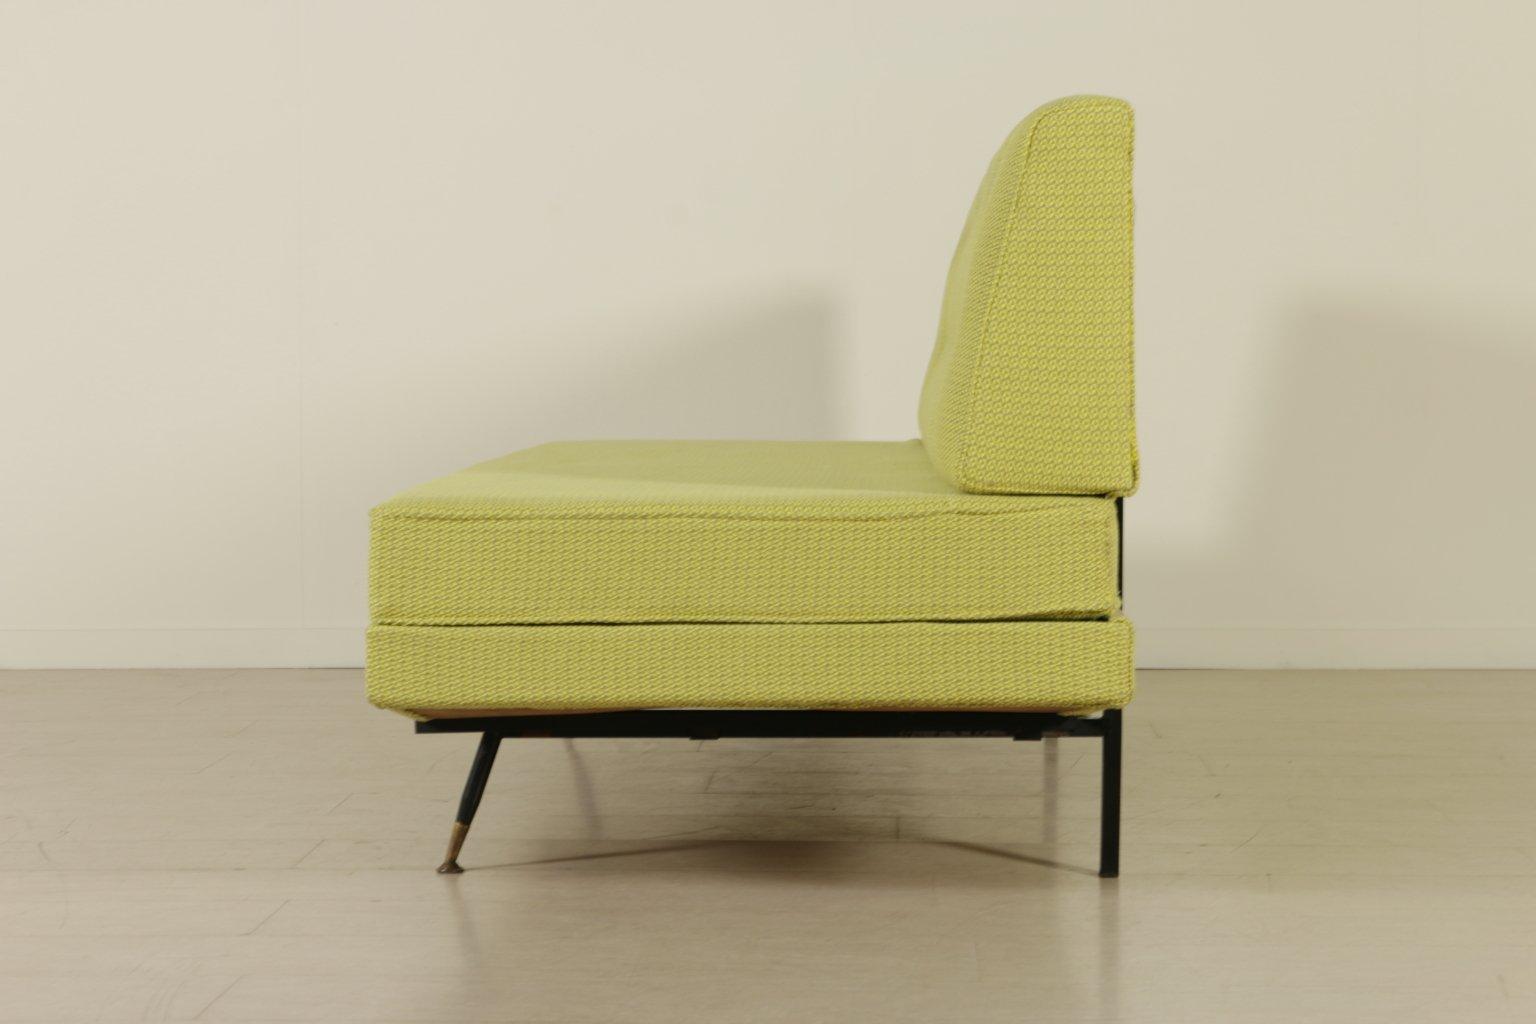 gelbes vintage sofa 1950er bei pamono kaufen. Black Bedroom Furniture Sets. Home Design Ideas